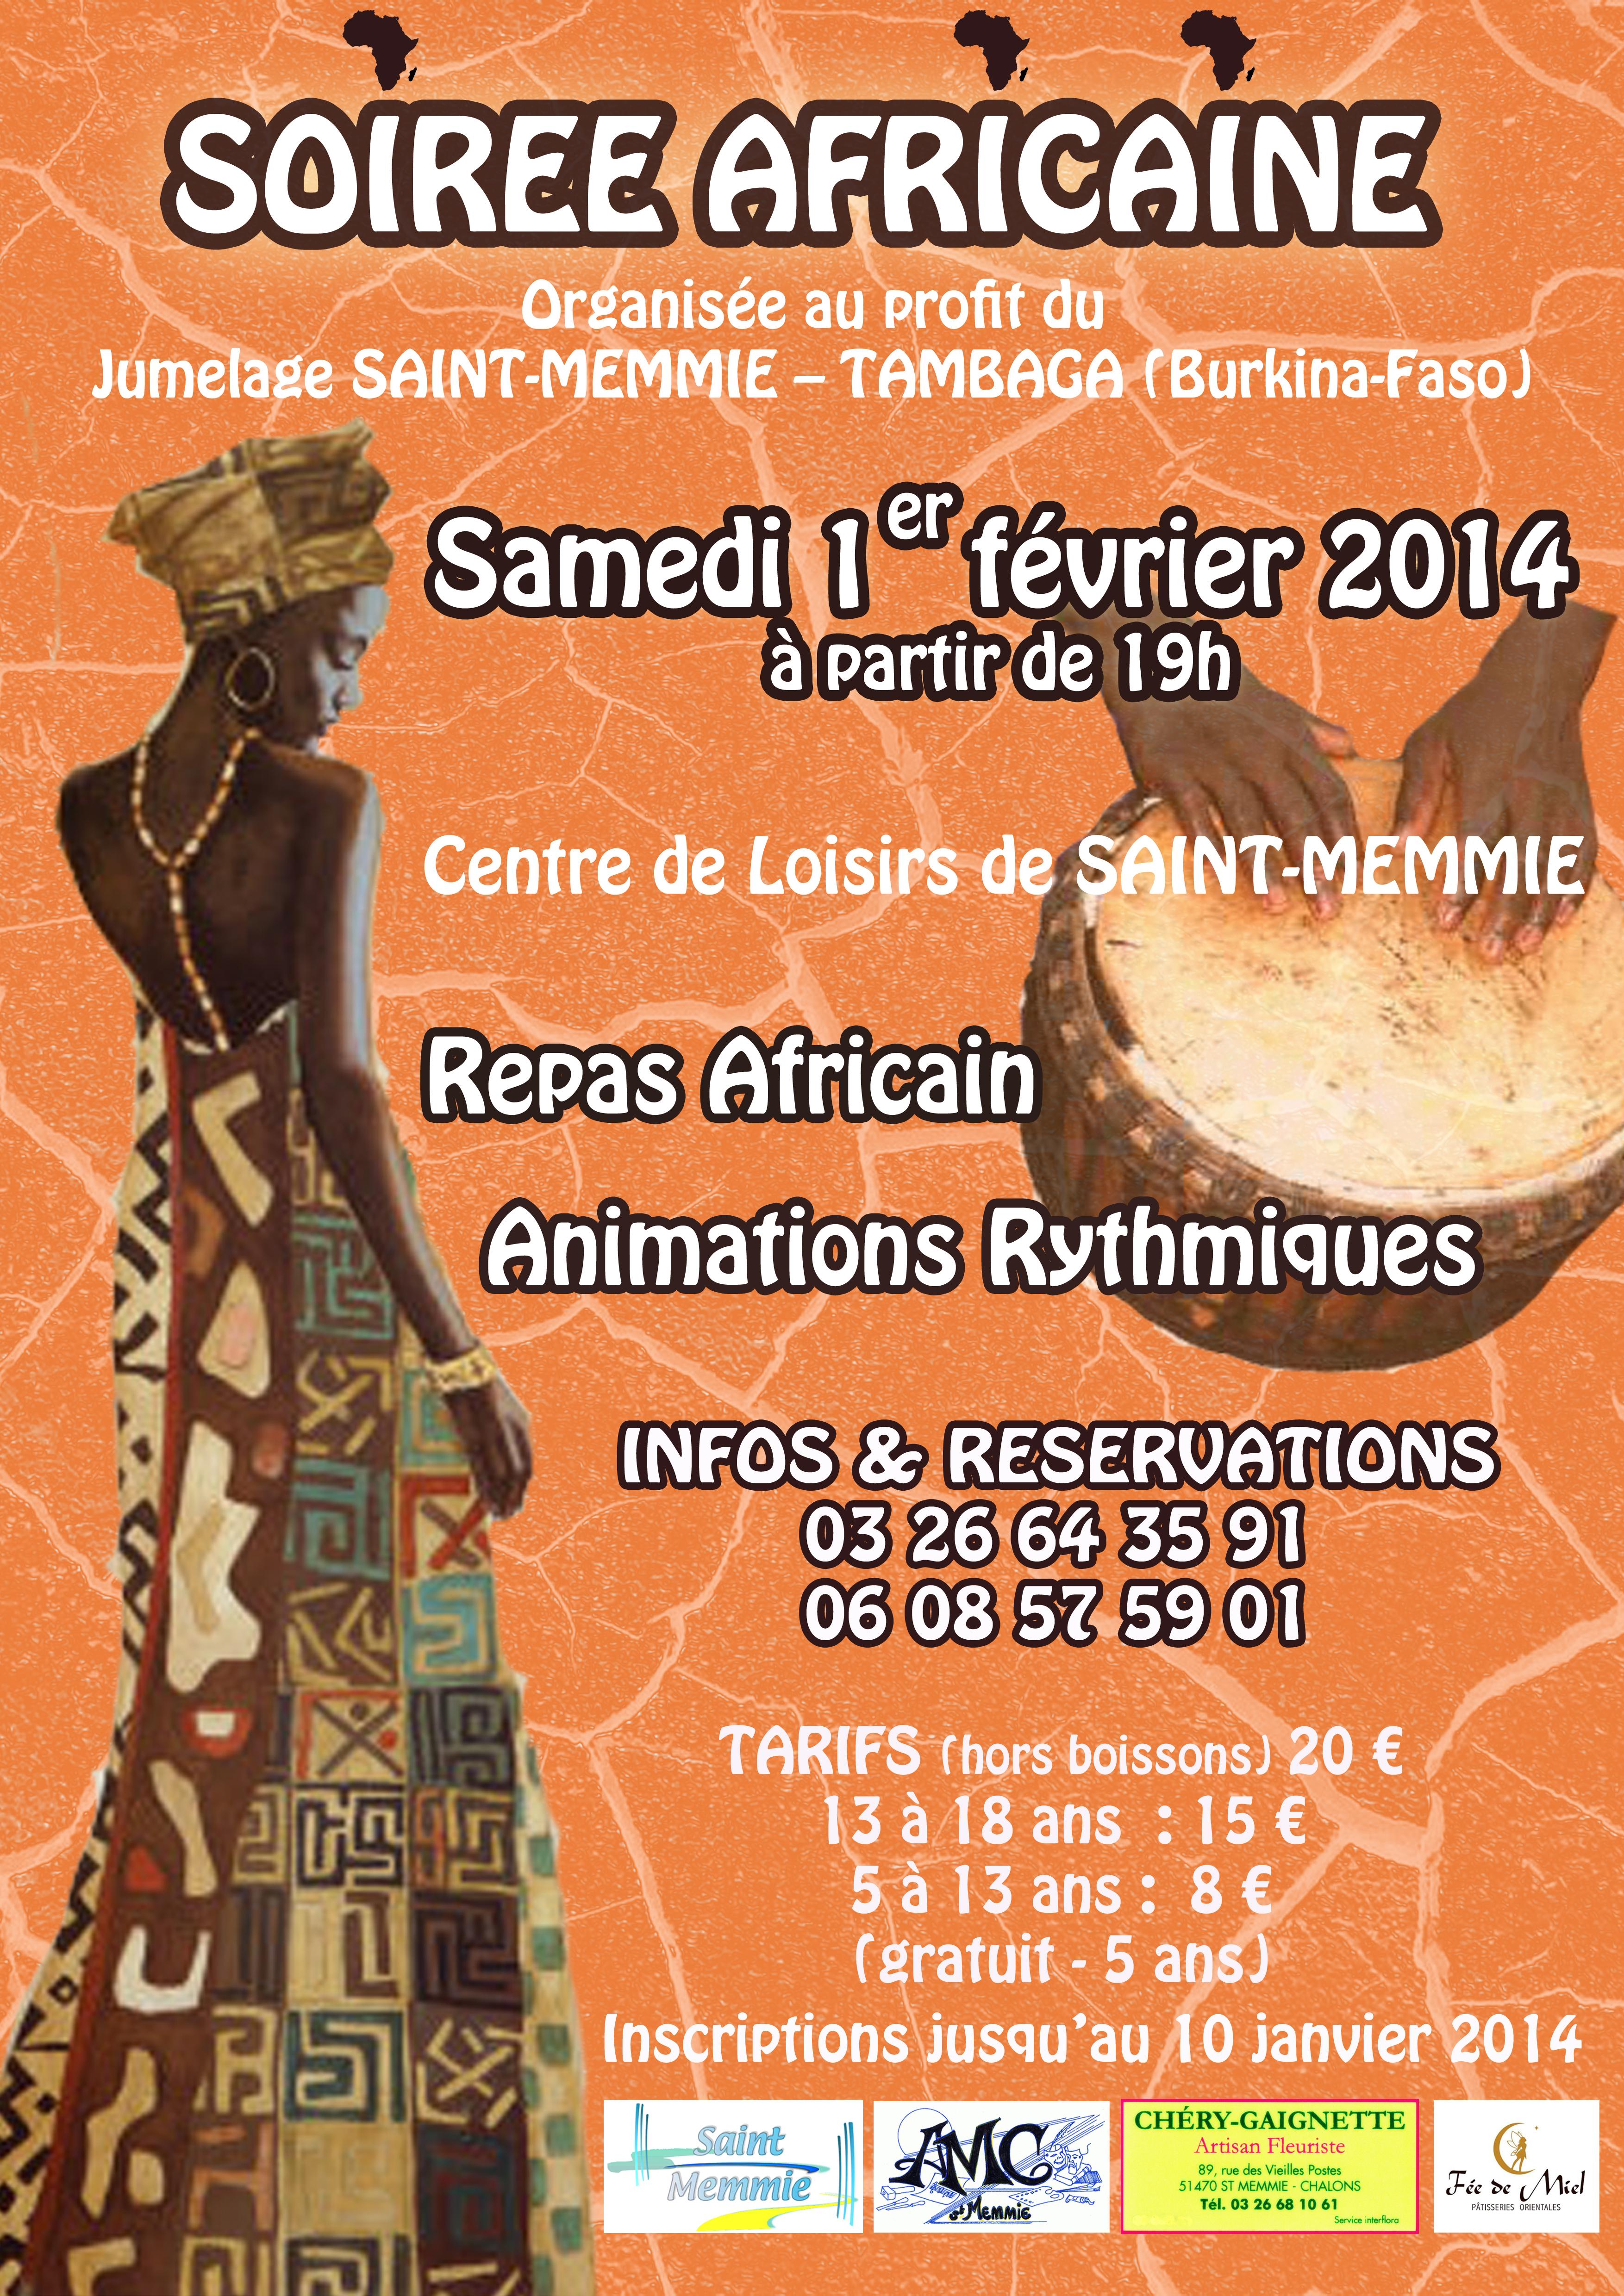 Affiche_Soiree_Africaine